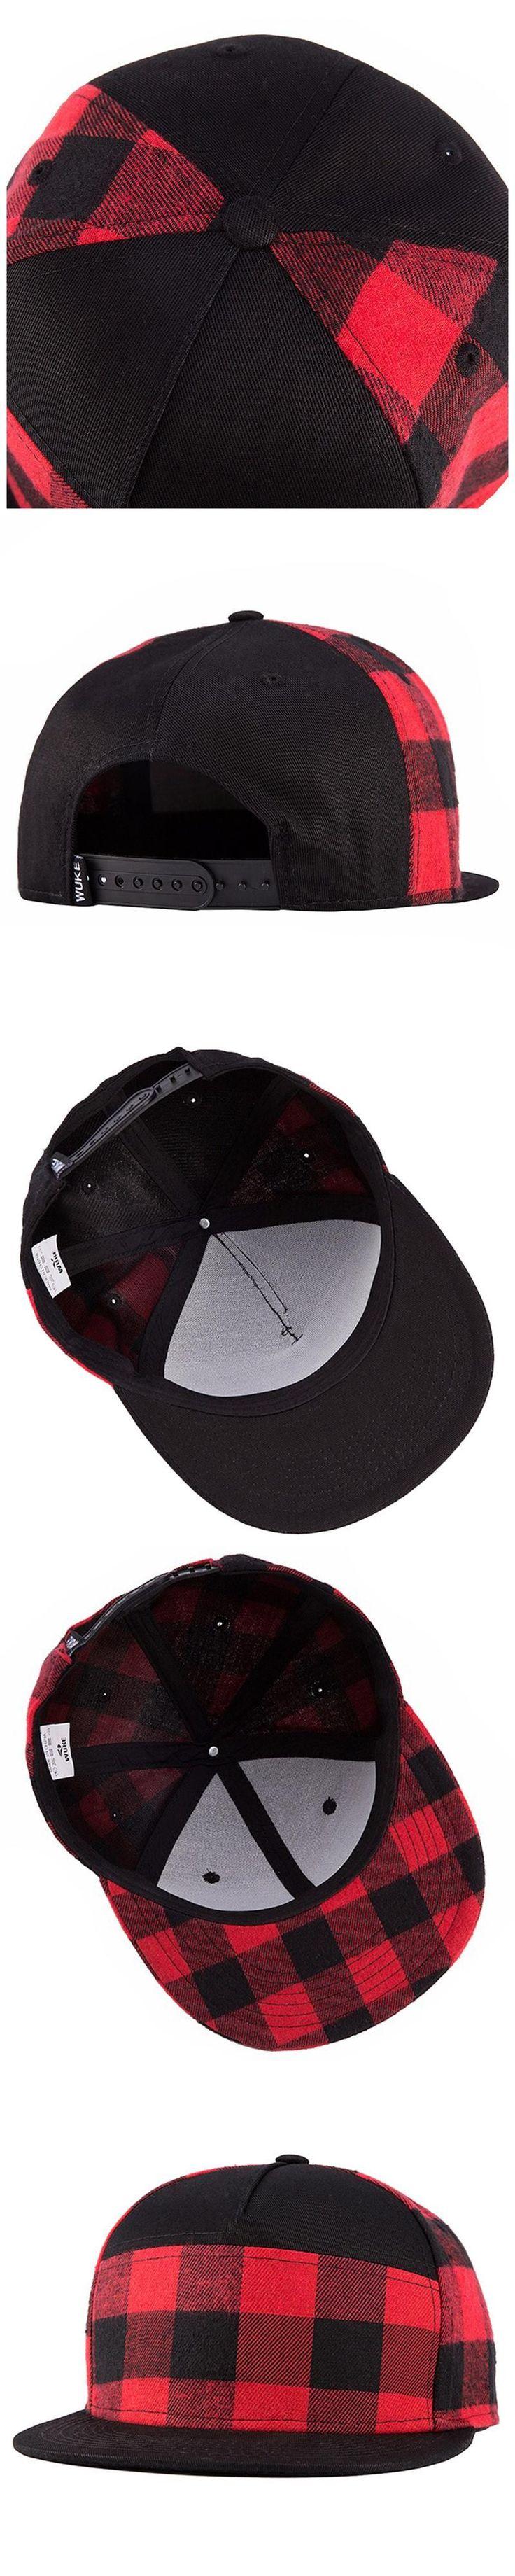 IMC WuKe Plaid Snapback Hip Hop Cap Baseball Skateboard Hip Hop Cap Men Women Basketball Snapback Hiphop Size 55-60cm Black +